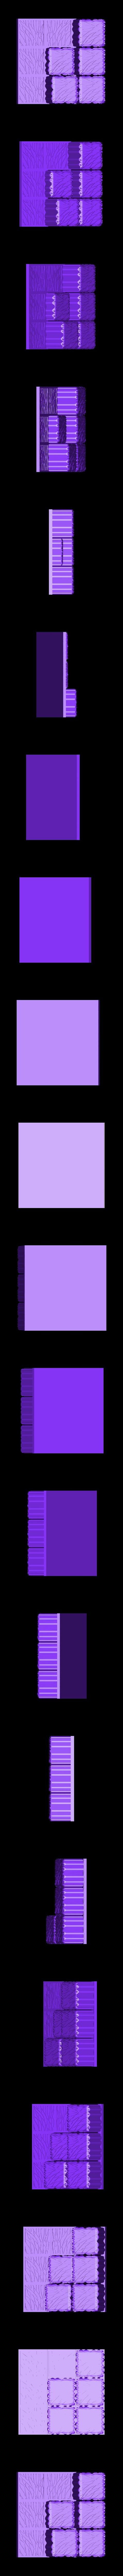 GrassElevatedA.stl Download free STL file Modular Grassland Tactics Tiles (18mm scale) • 3D printable model, Dutchmogul